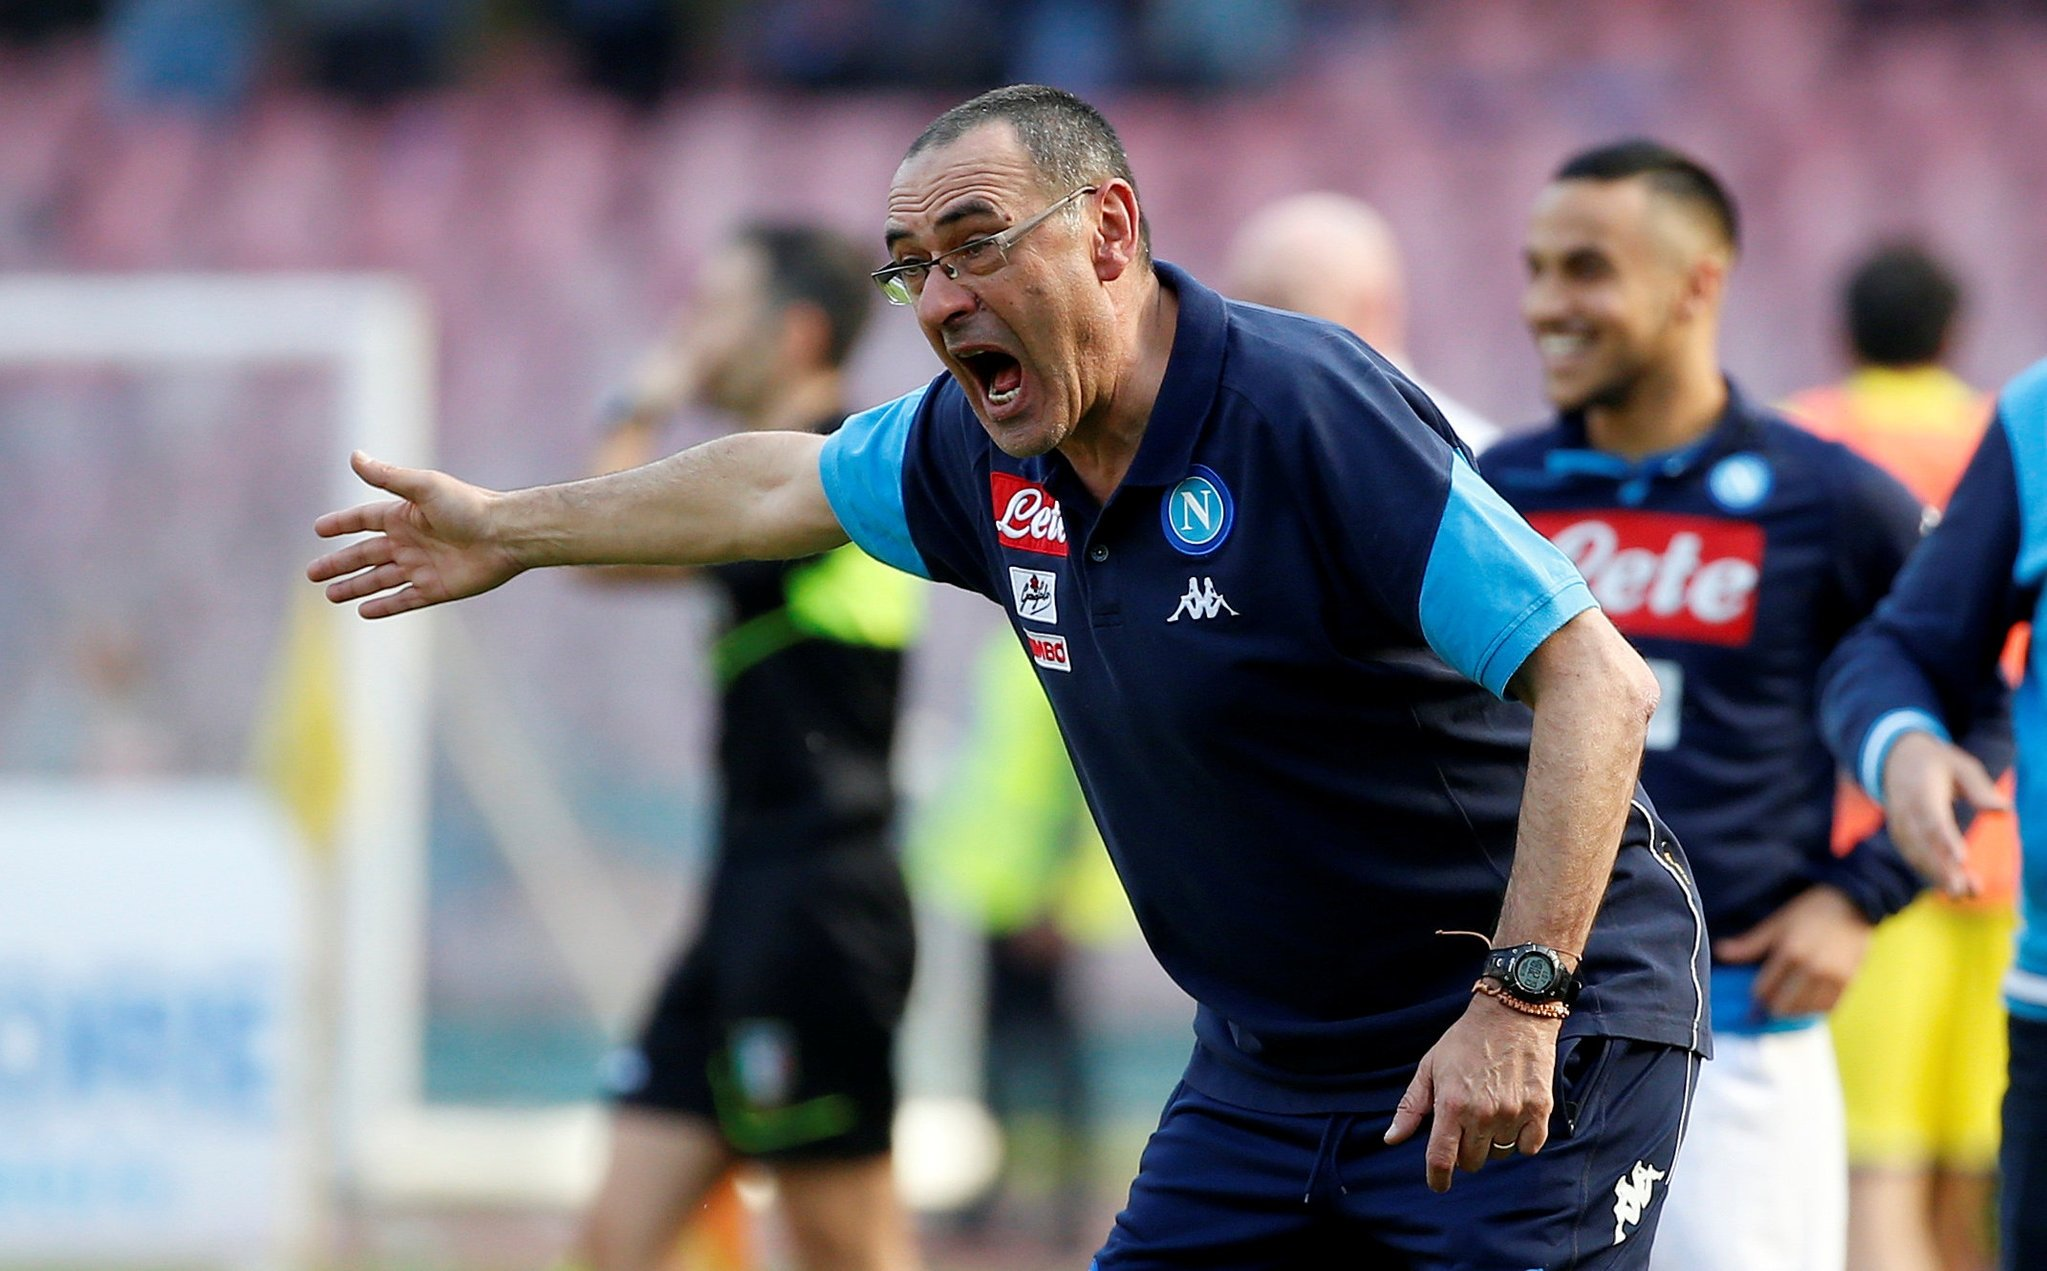 İtalyanlardan flaş iddia: Galatasarayda Fatih Terimin yerine Sarri!..